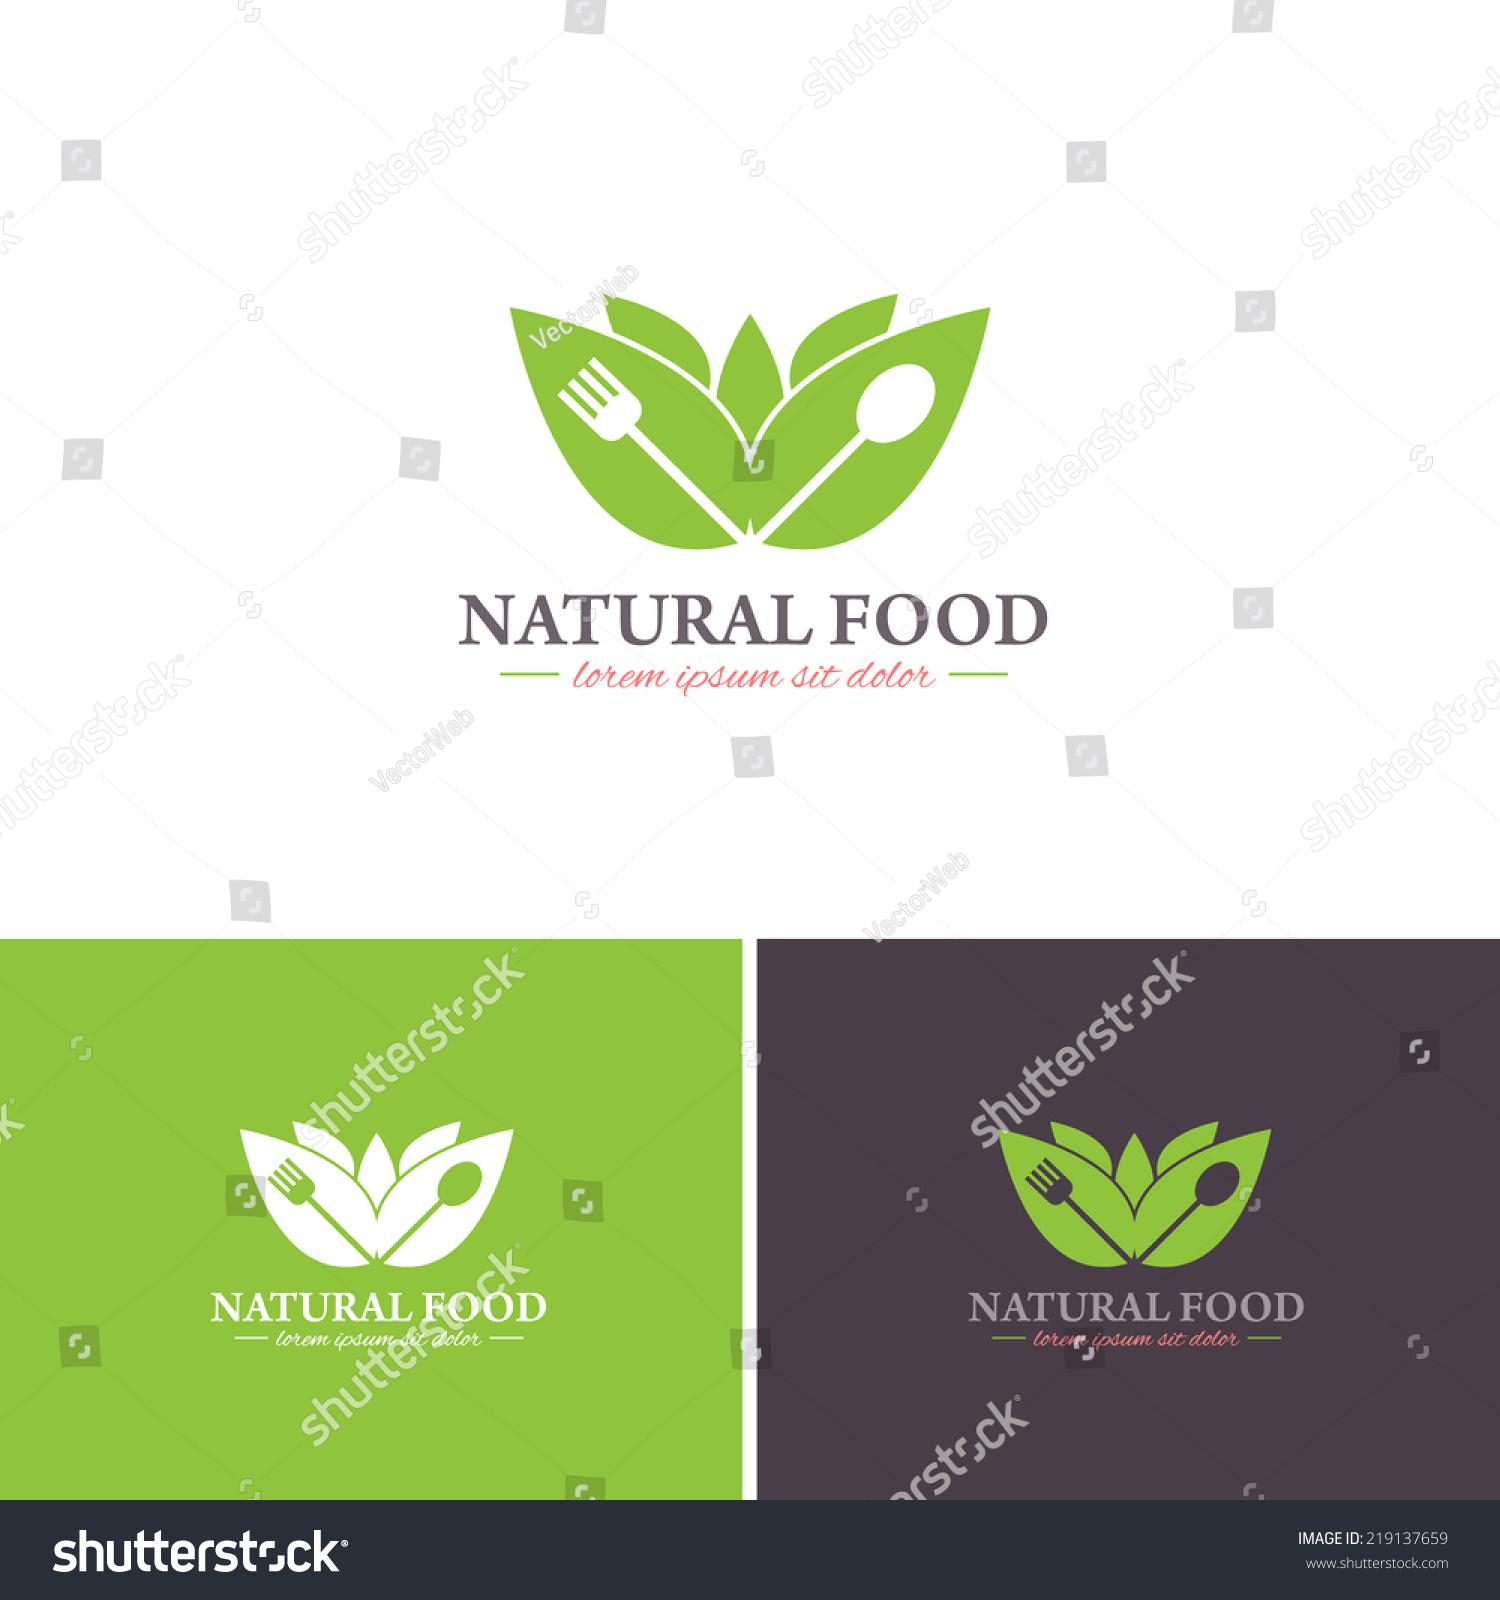 Natural Food Vector Icons Logos Sign Stock Vector ...